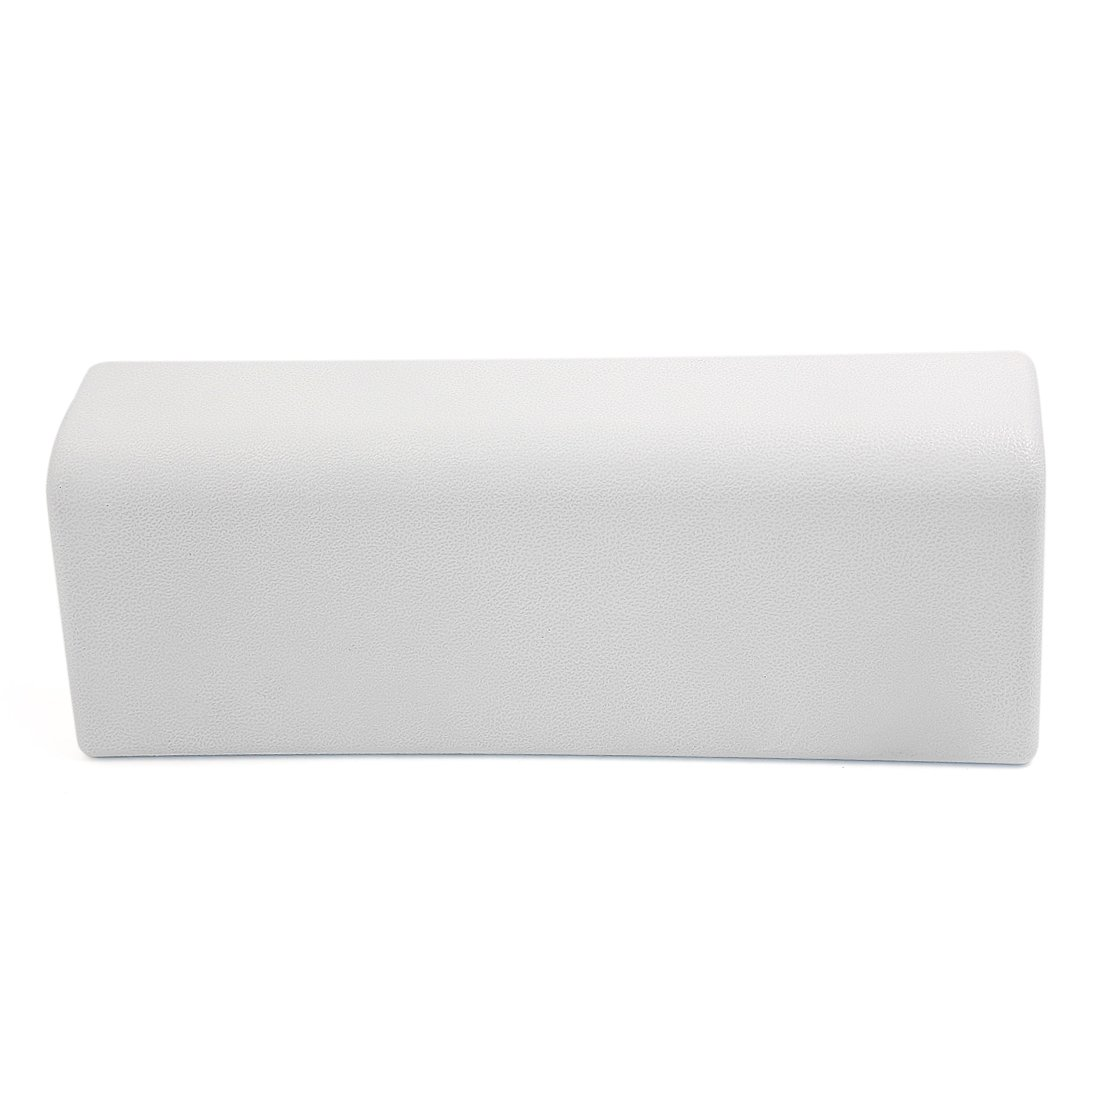 uxcell Waterproof Spa Bath Pillow Non-Slip Headrest Shoulder Sponge Bathtub Cushion White